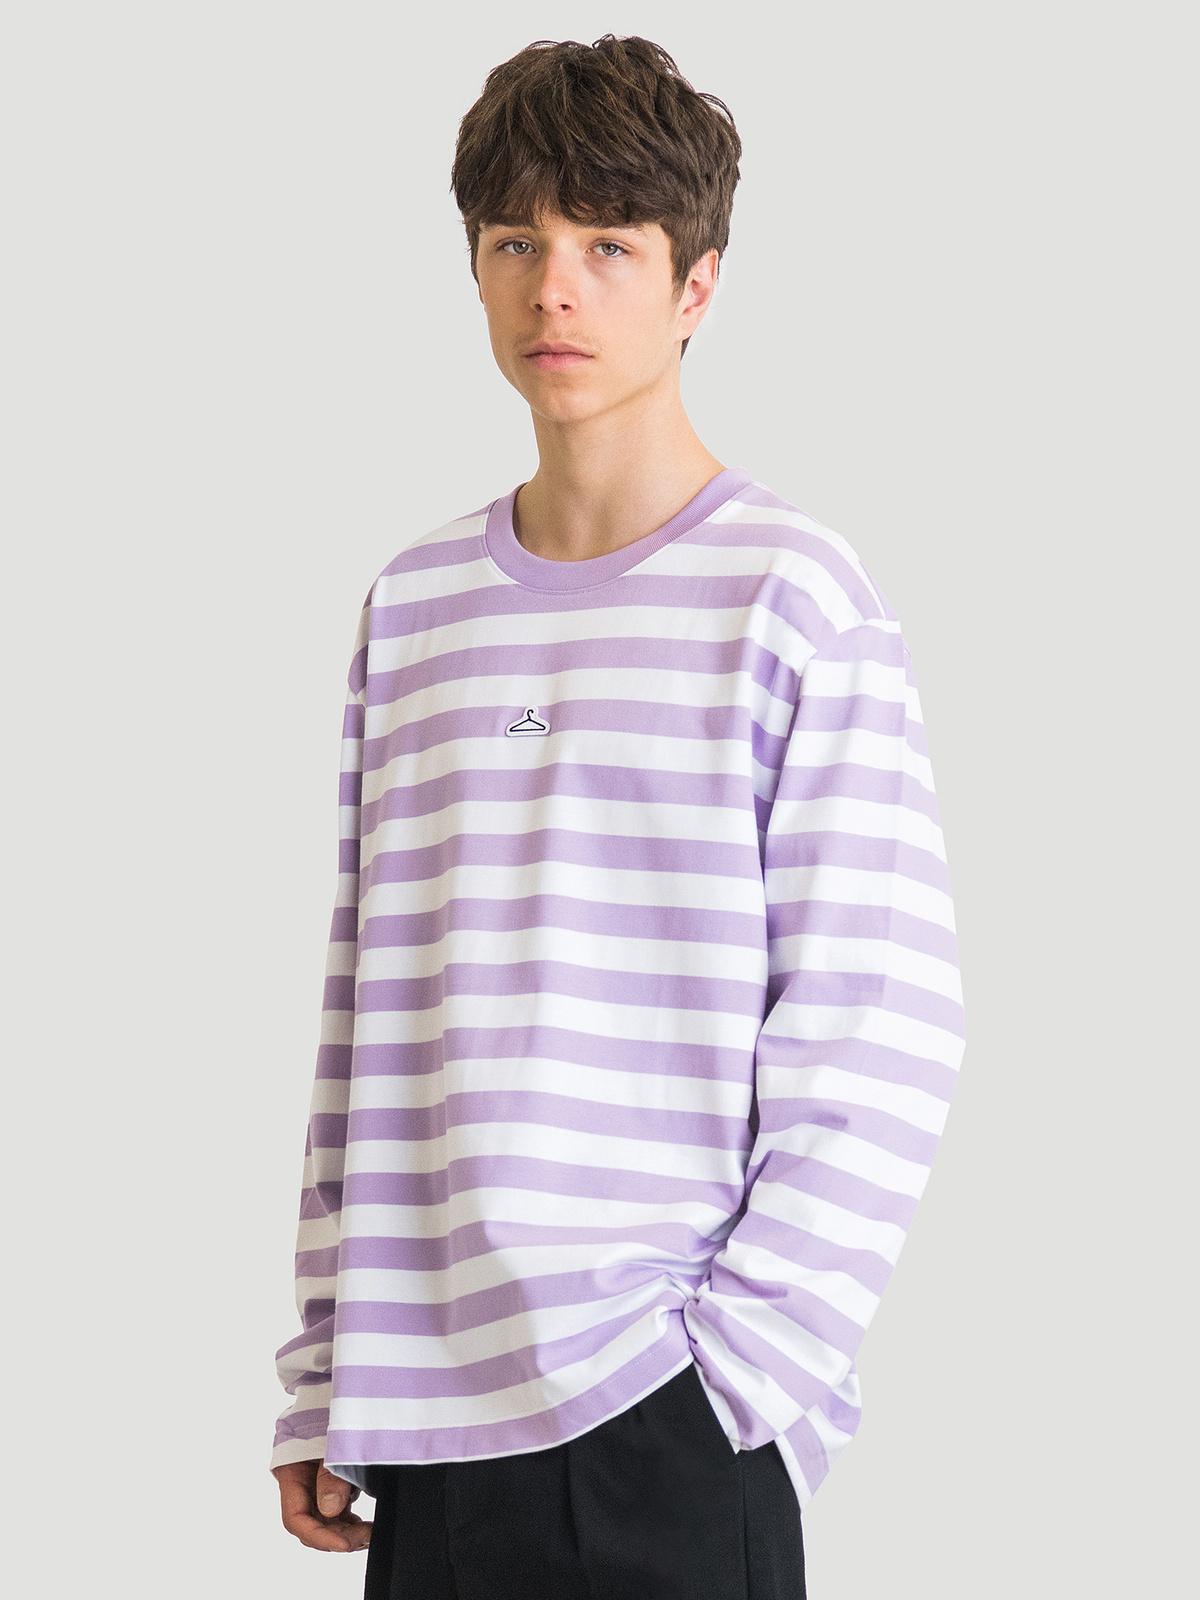 Hanger Striped Longsleeve Lilac White 6